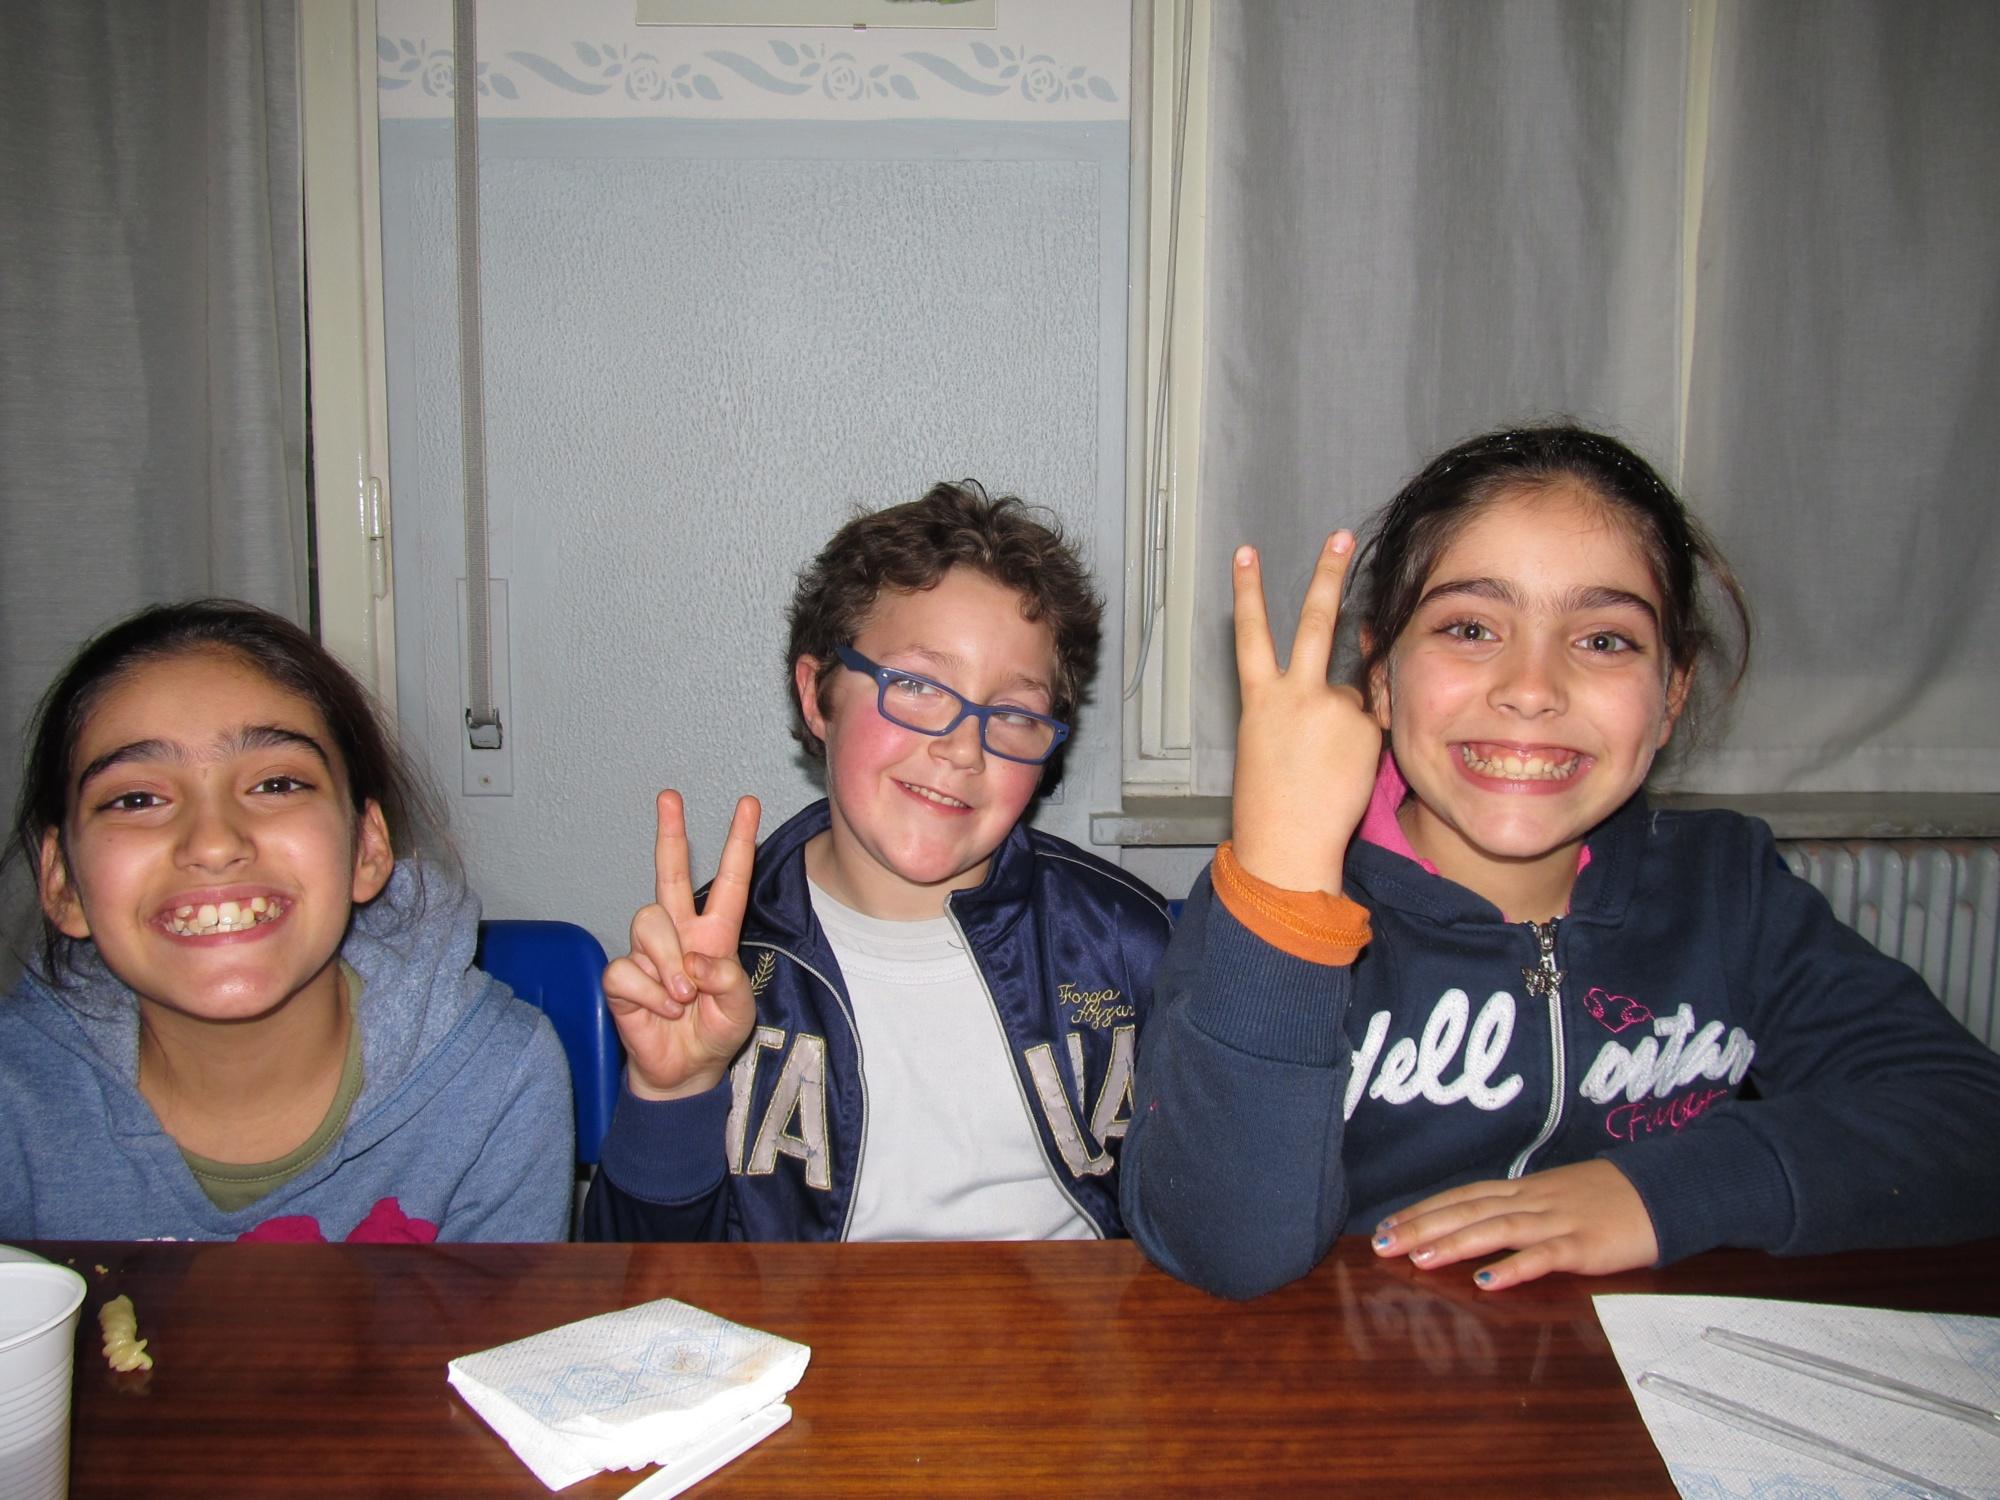 serata-acr-2014-12-06-20-02-26